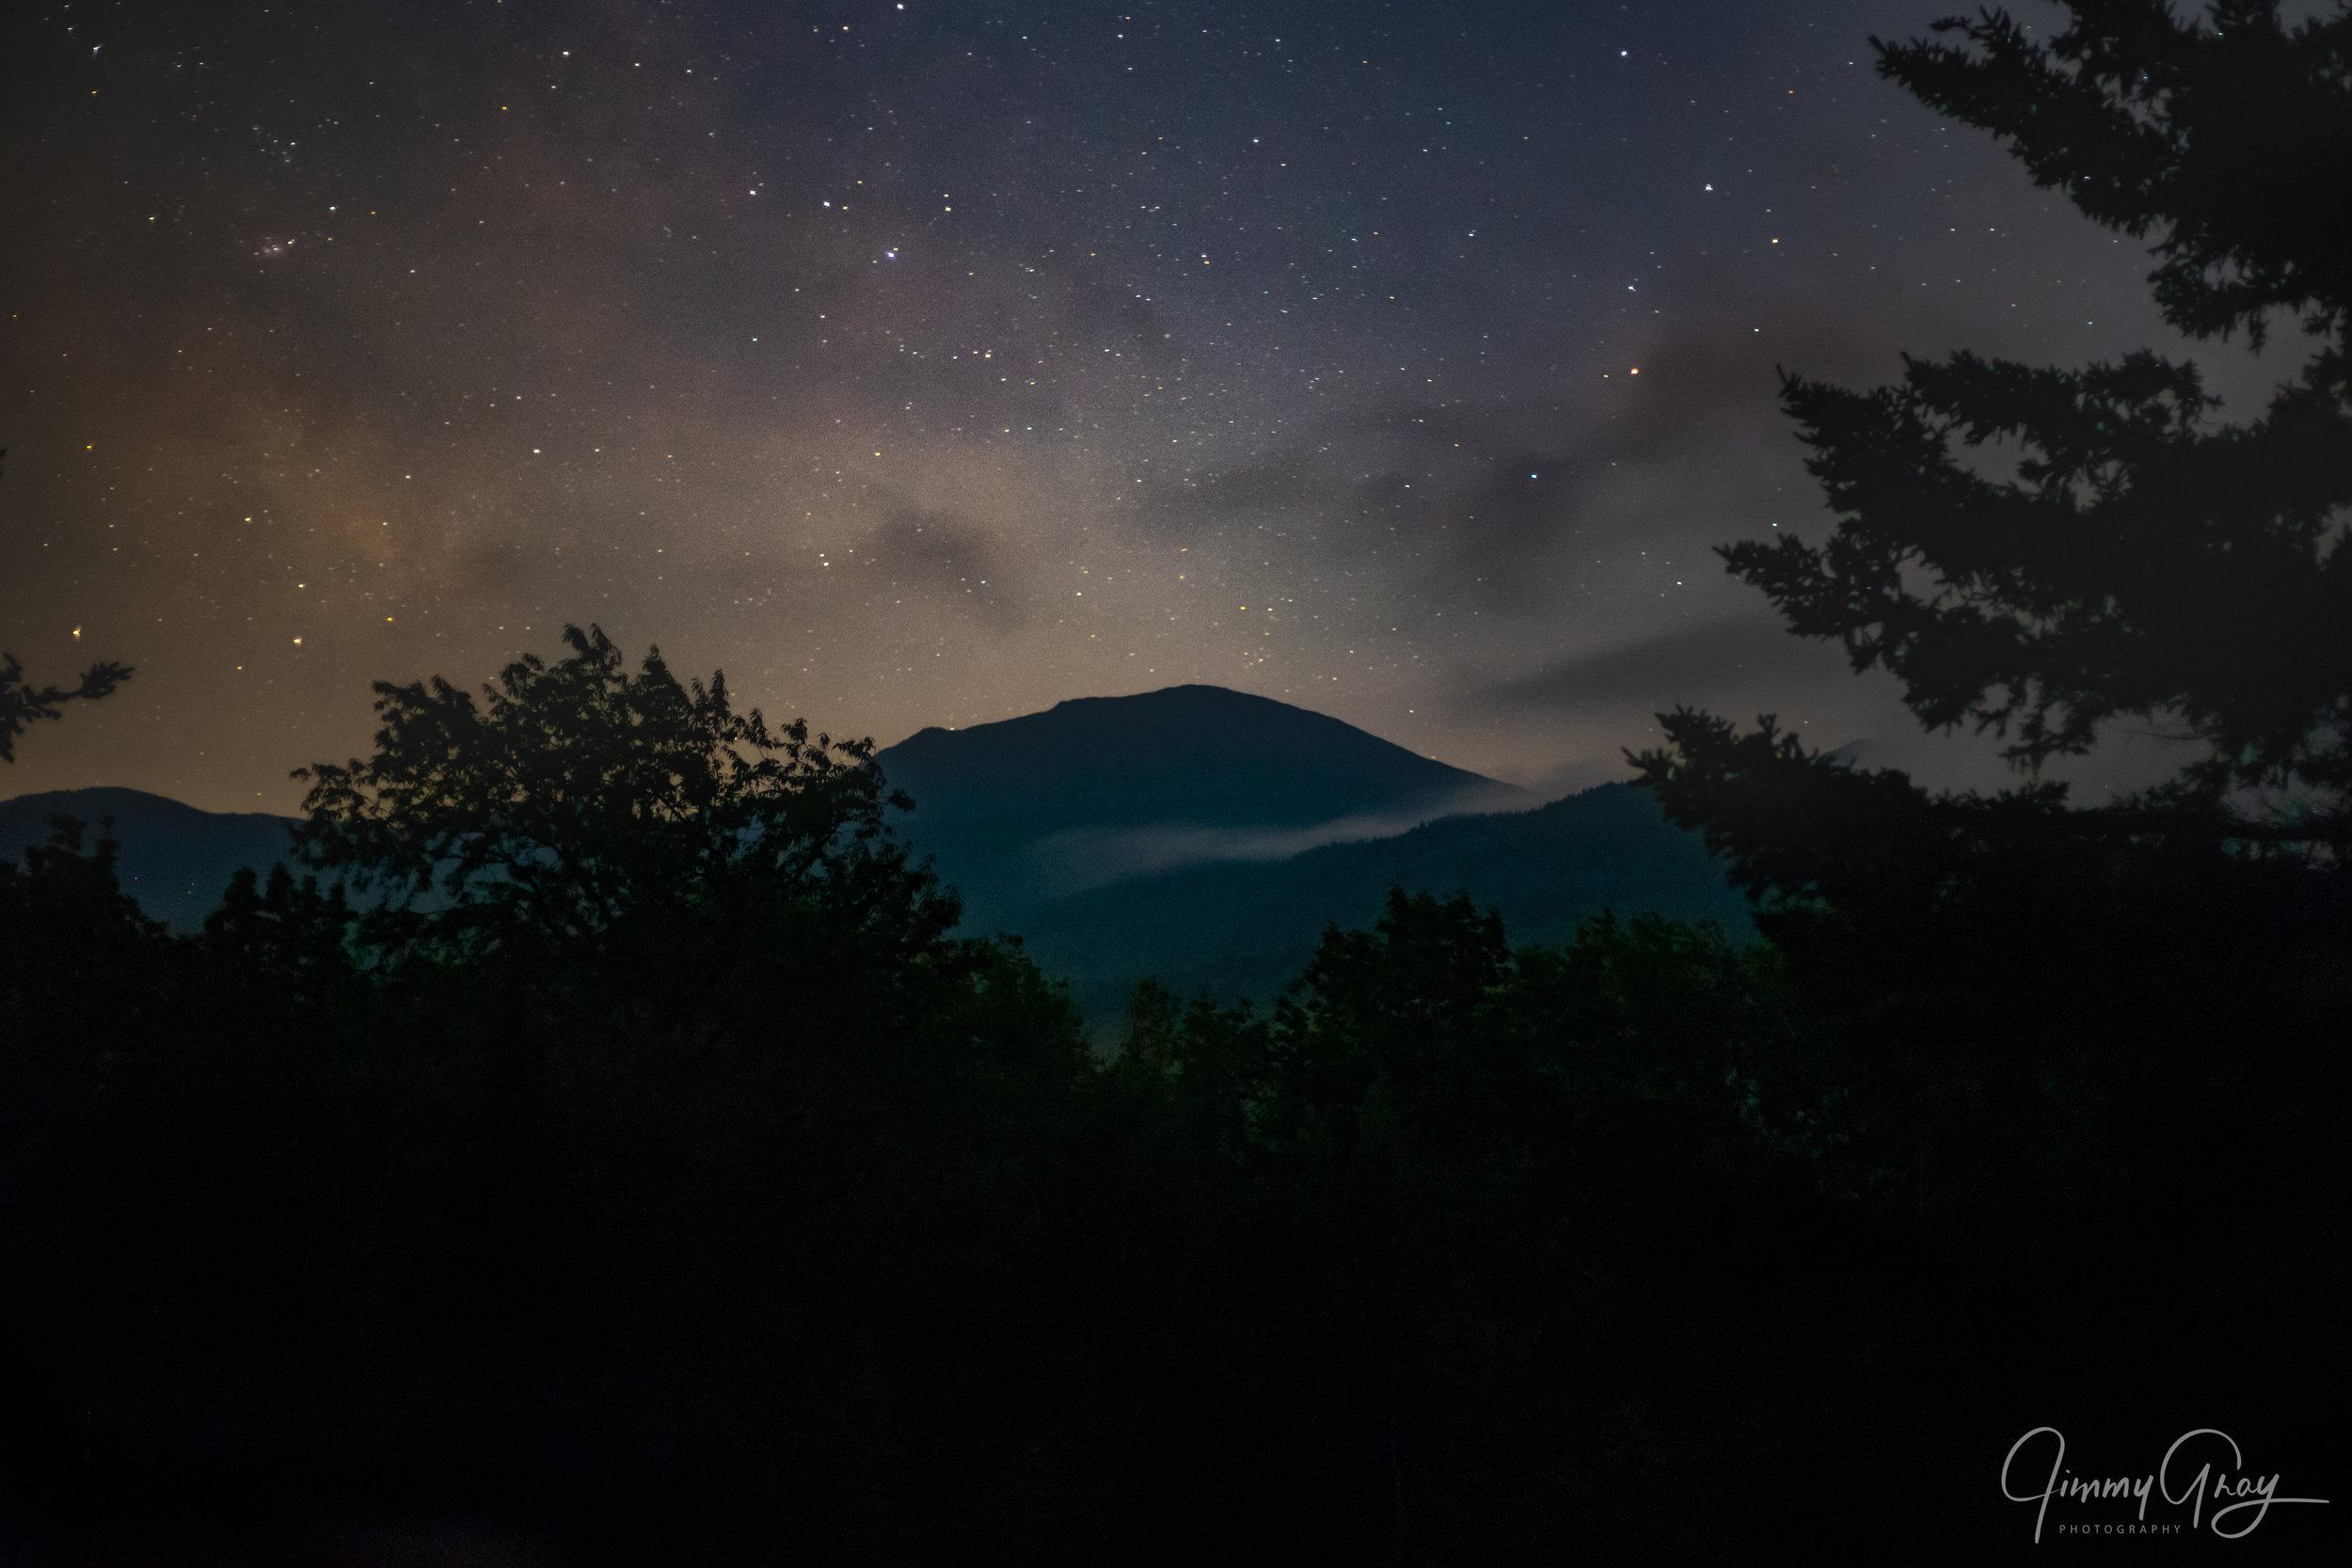 Midnight Mist Over The Mountains - Presidential Range Randolph, NH